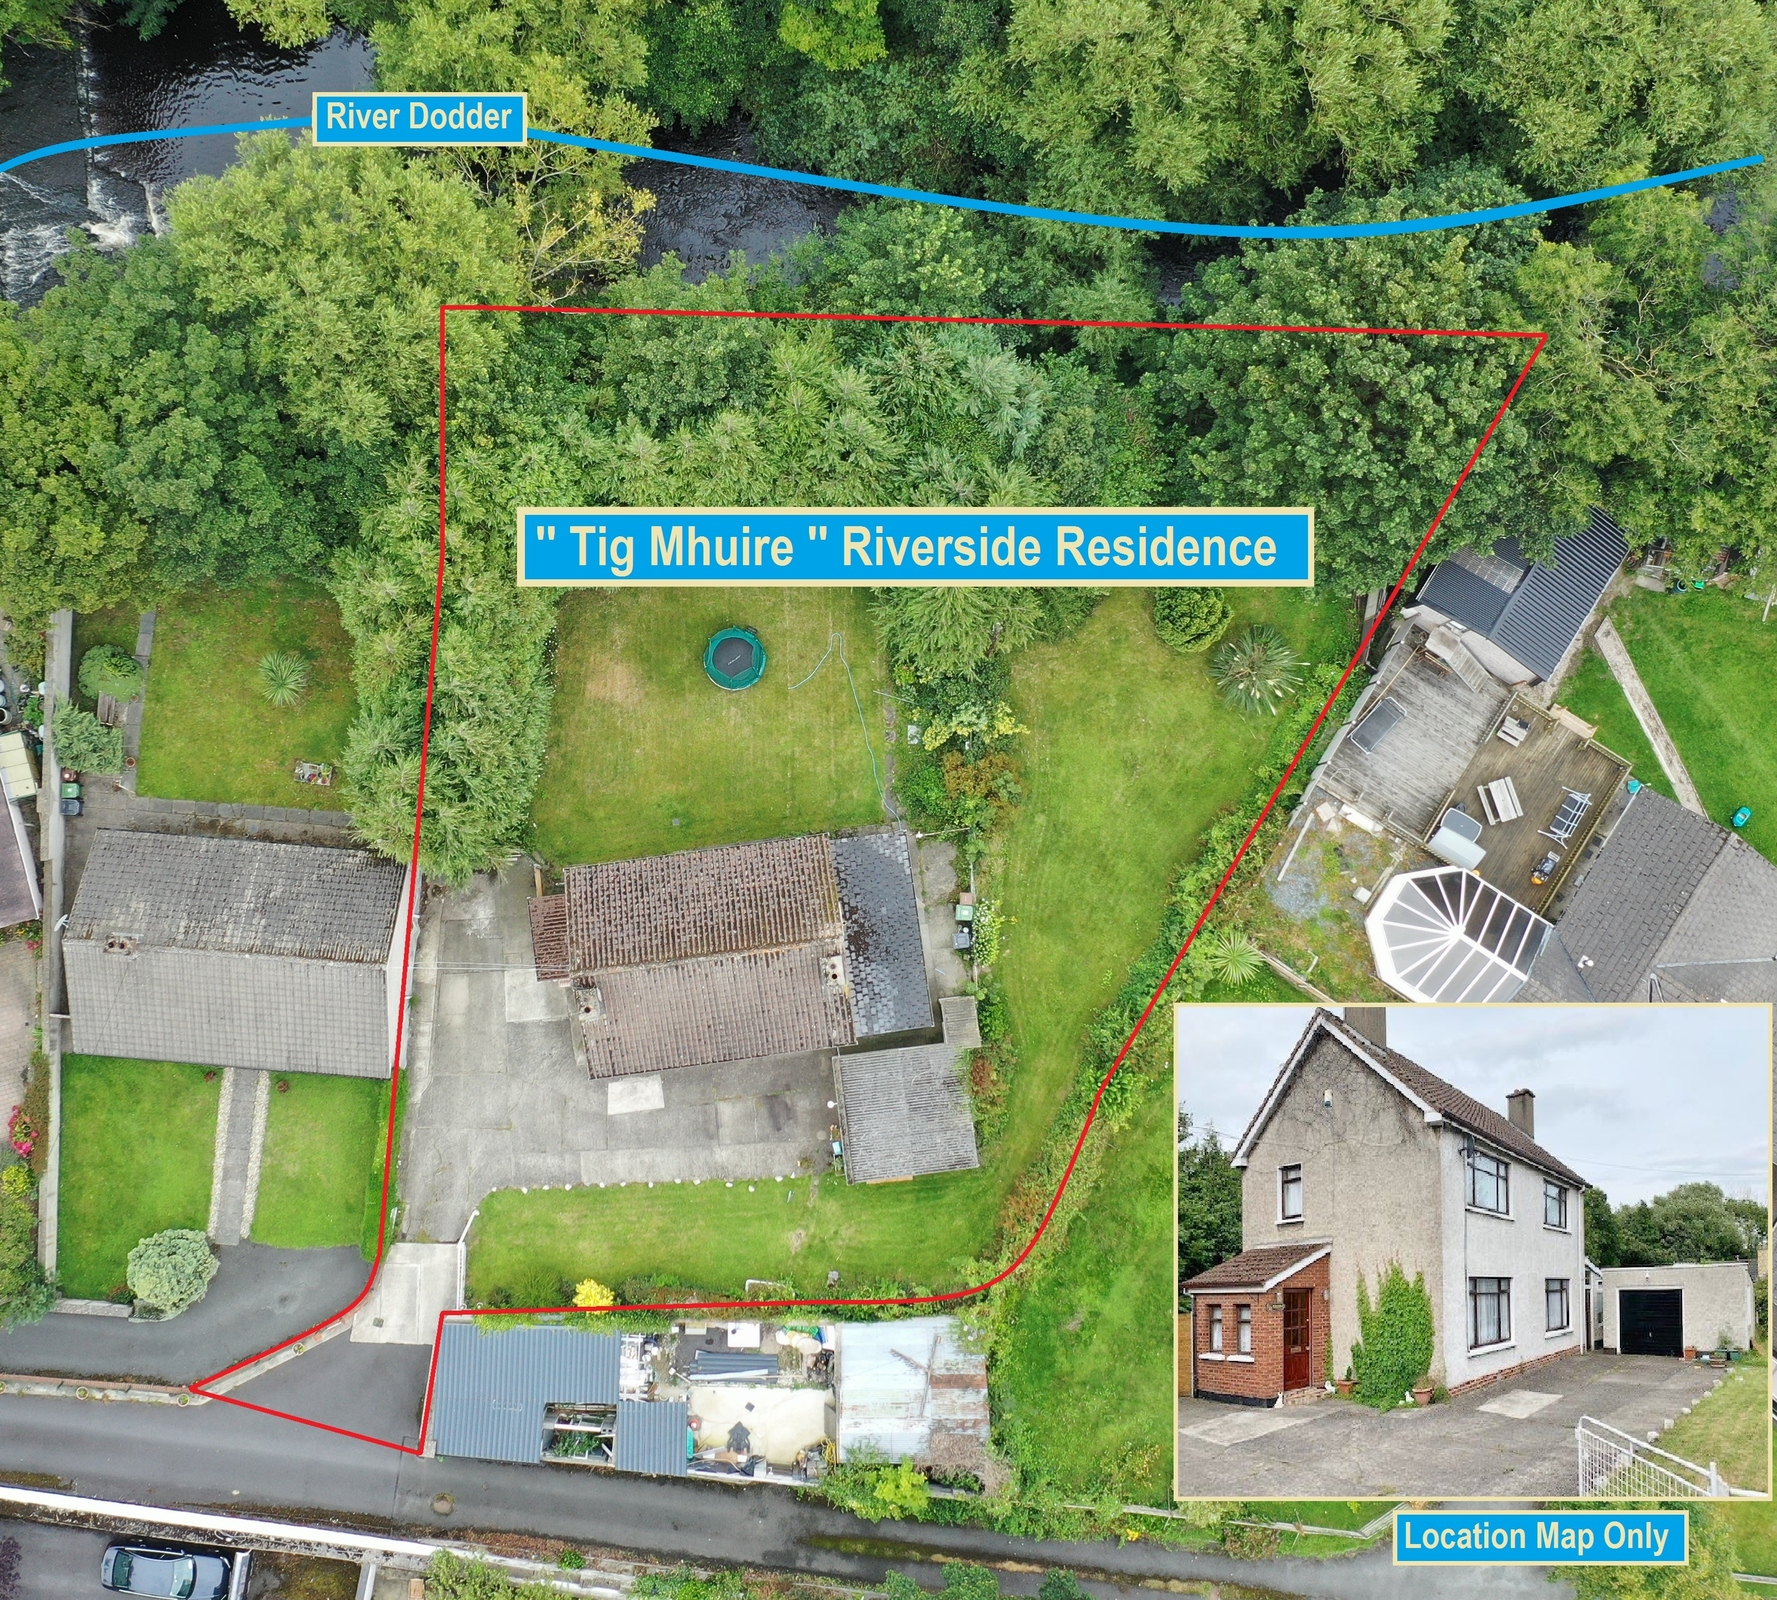 Tig Mhuire, Old Bridge Road, Templeogue, Dublin 6w